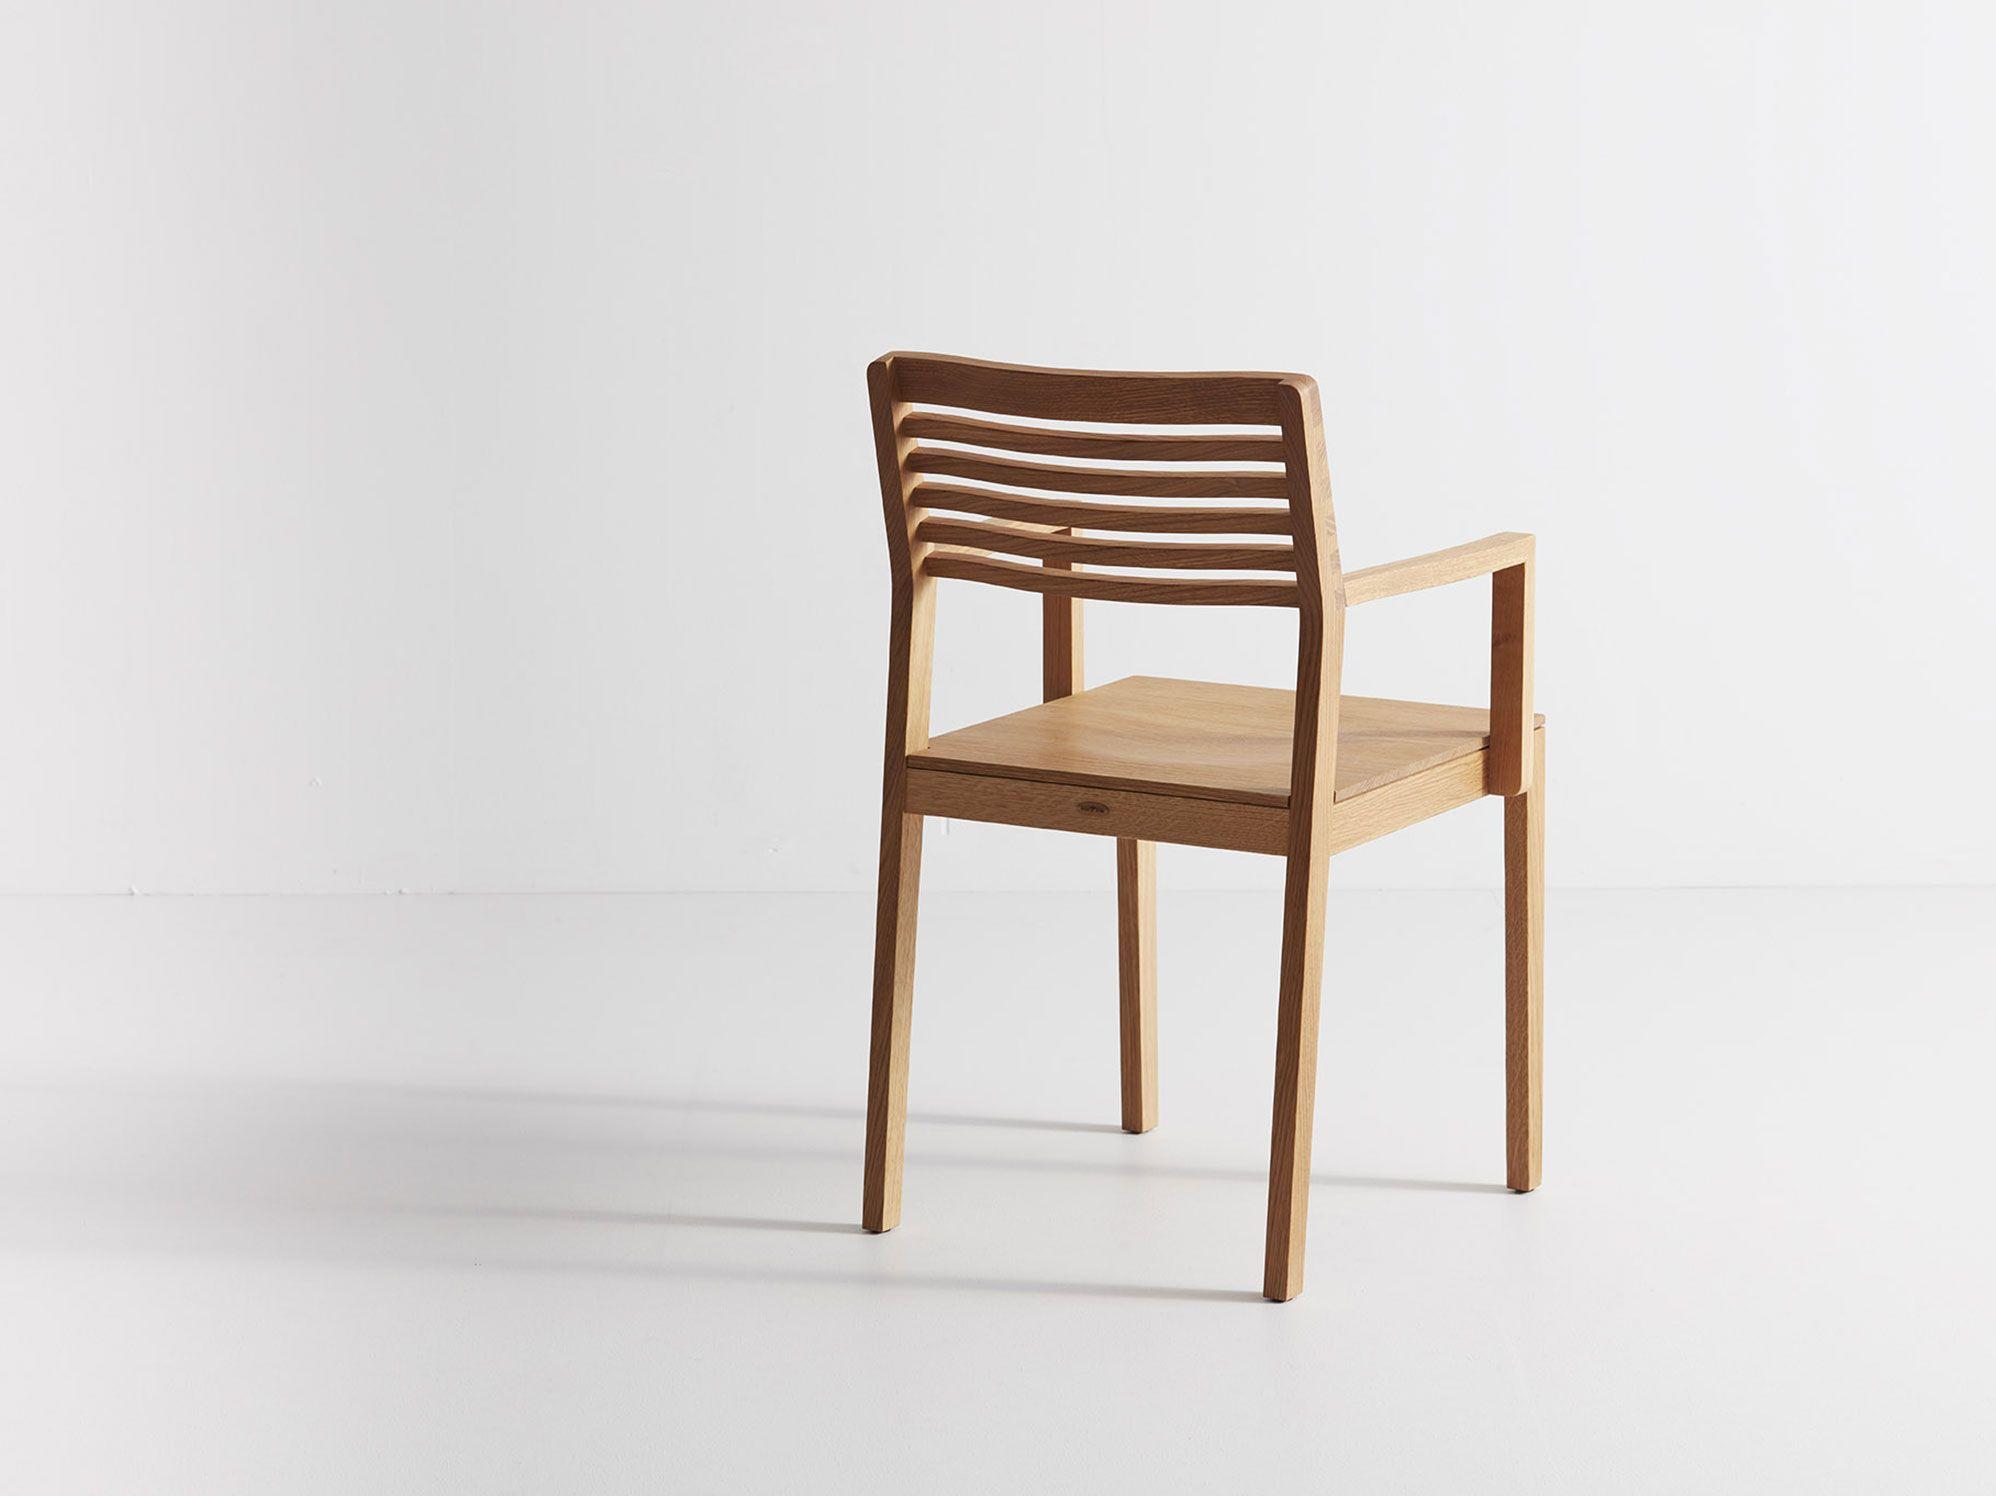 Set 2 Stk Stuhl Freddy Stuhle Grune Erde Esszimmer